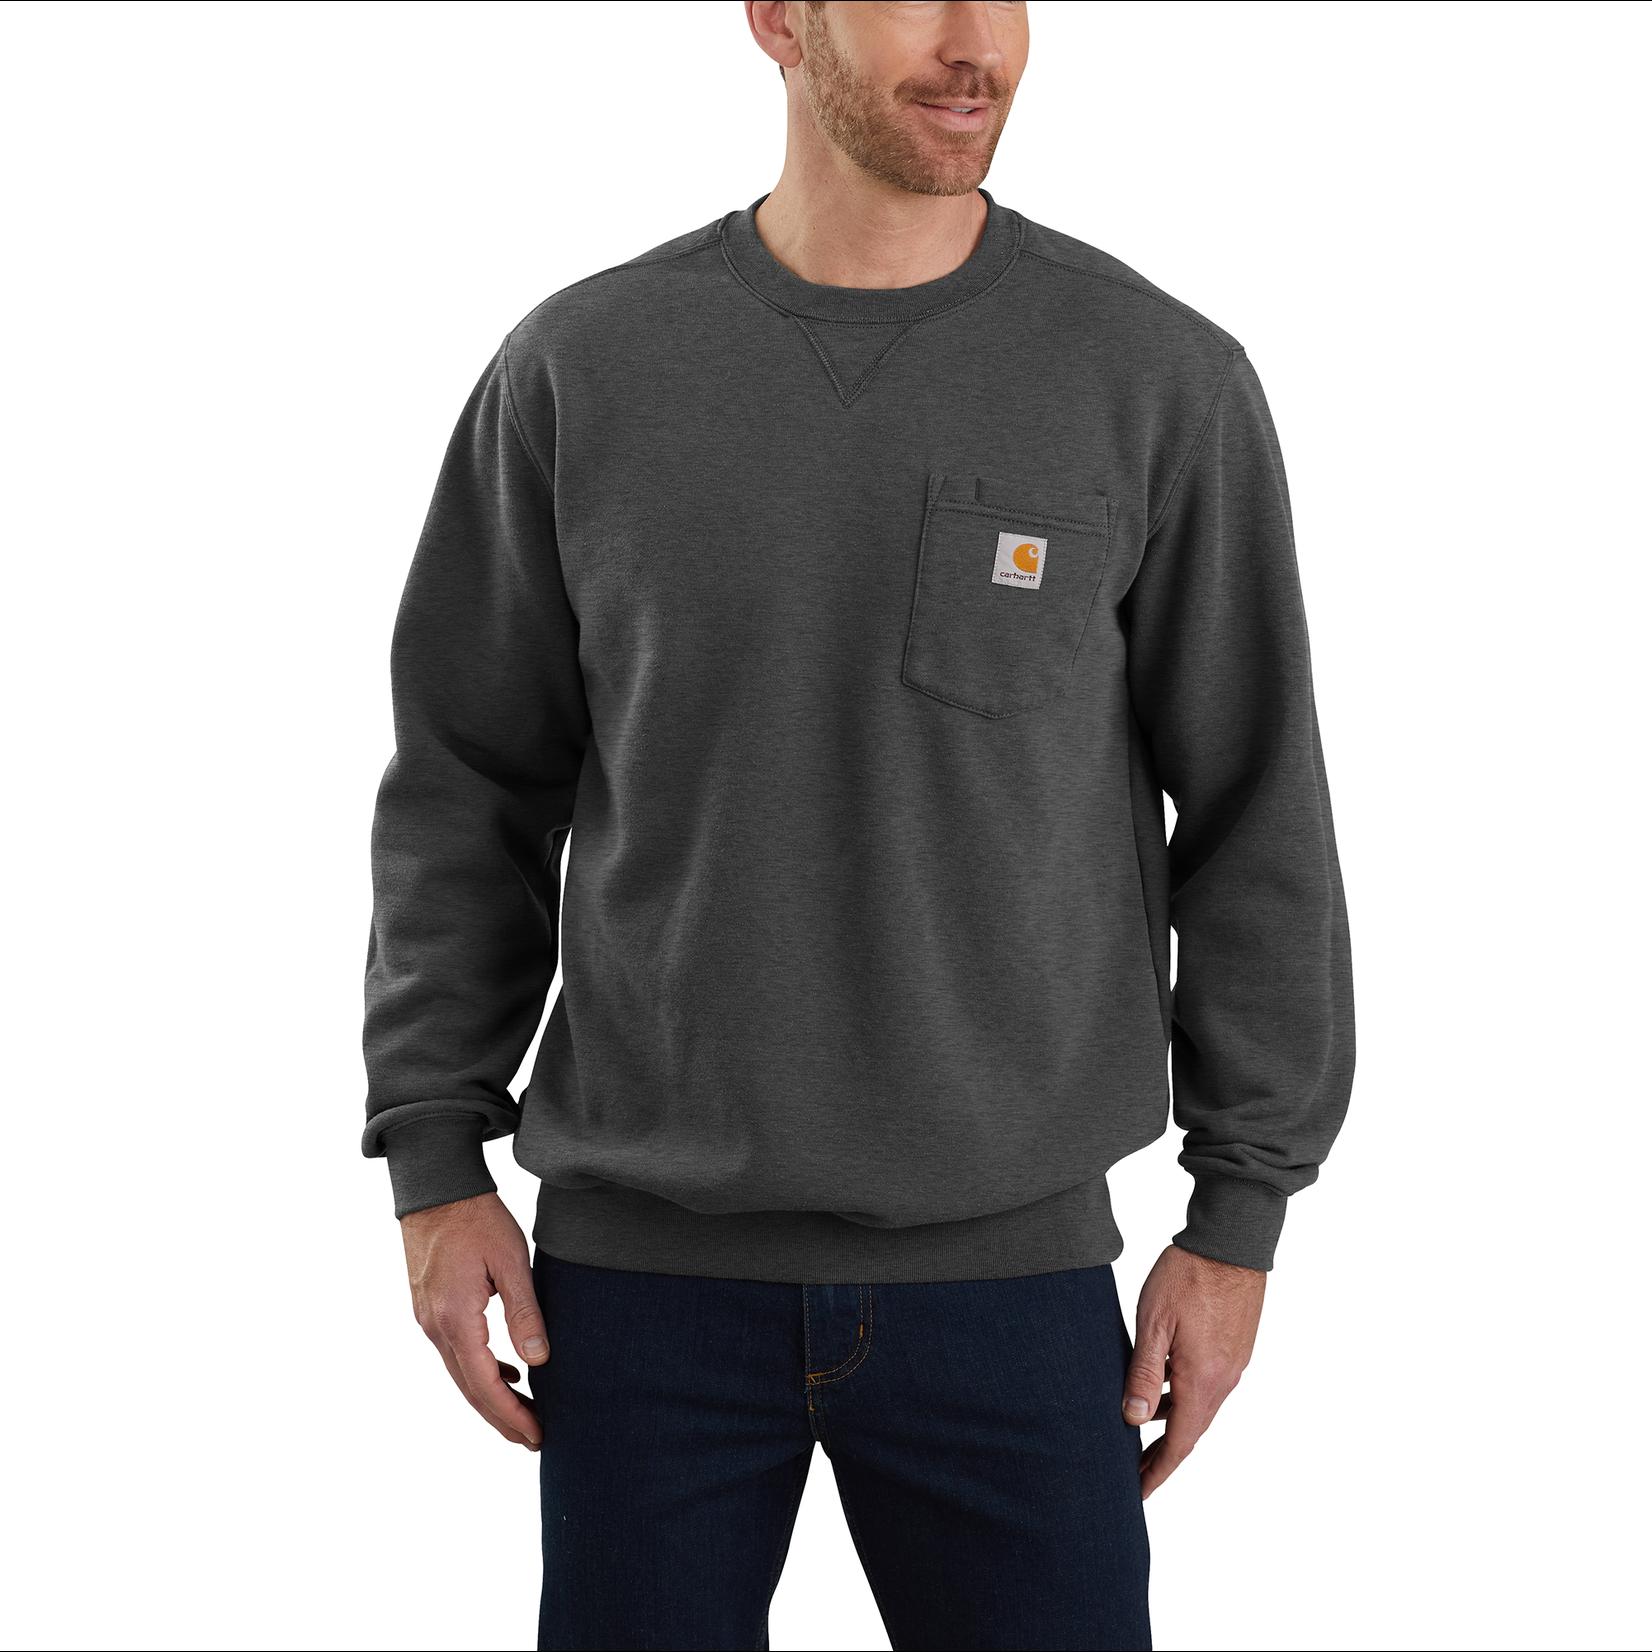 Carhartt Carhartt 103852 Pocketed Sweatshirt - Carbon Heather